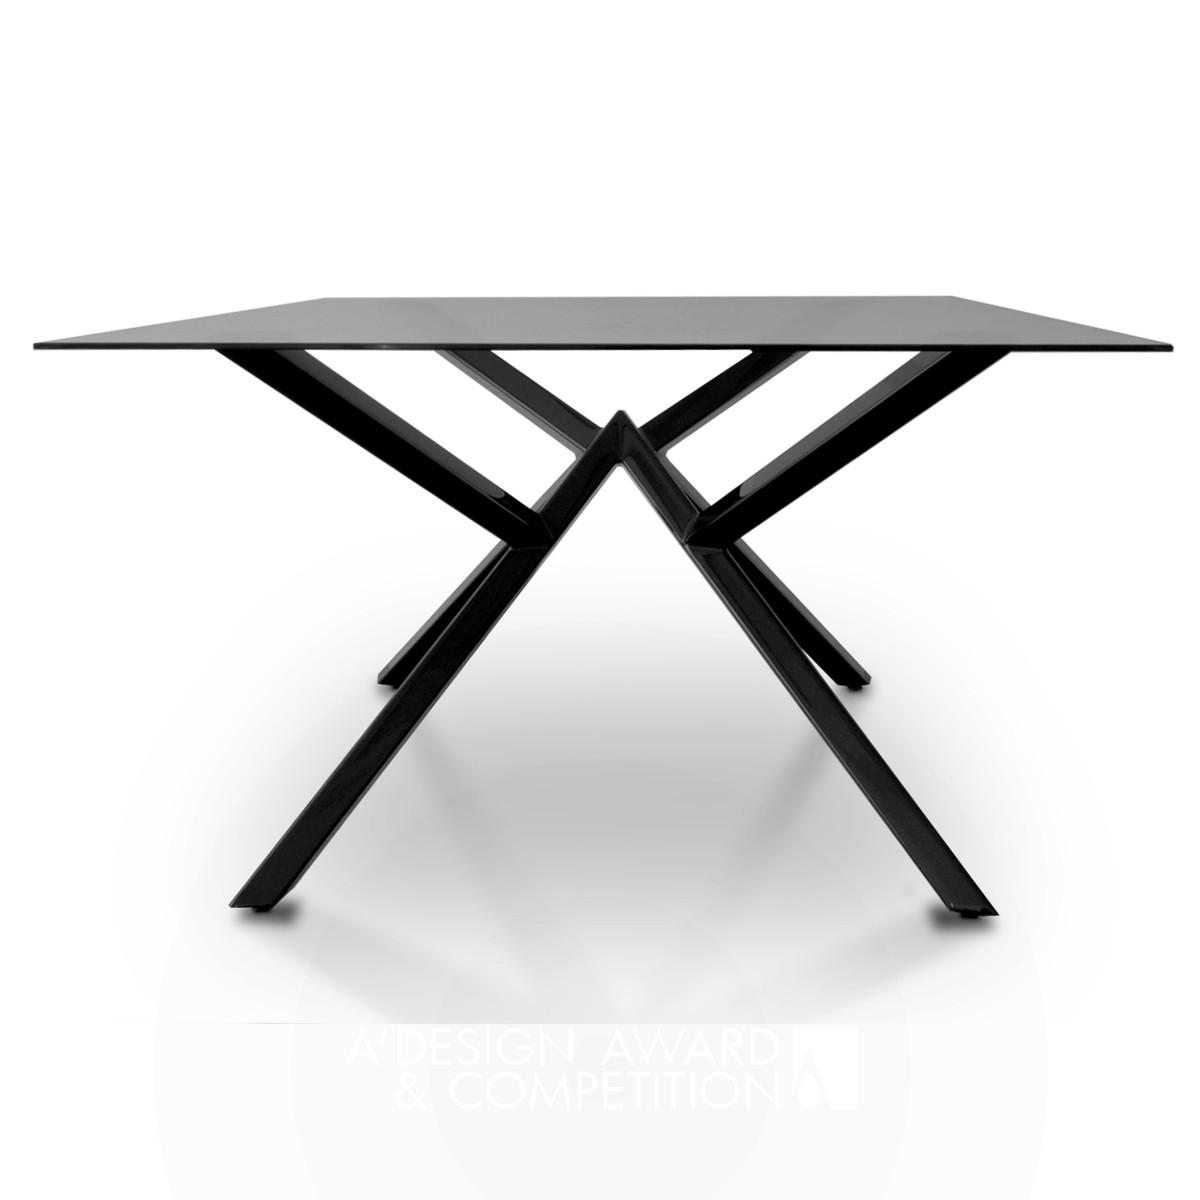 Interstellar table  Entrance Table